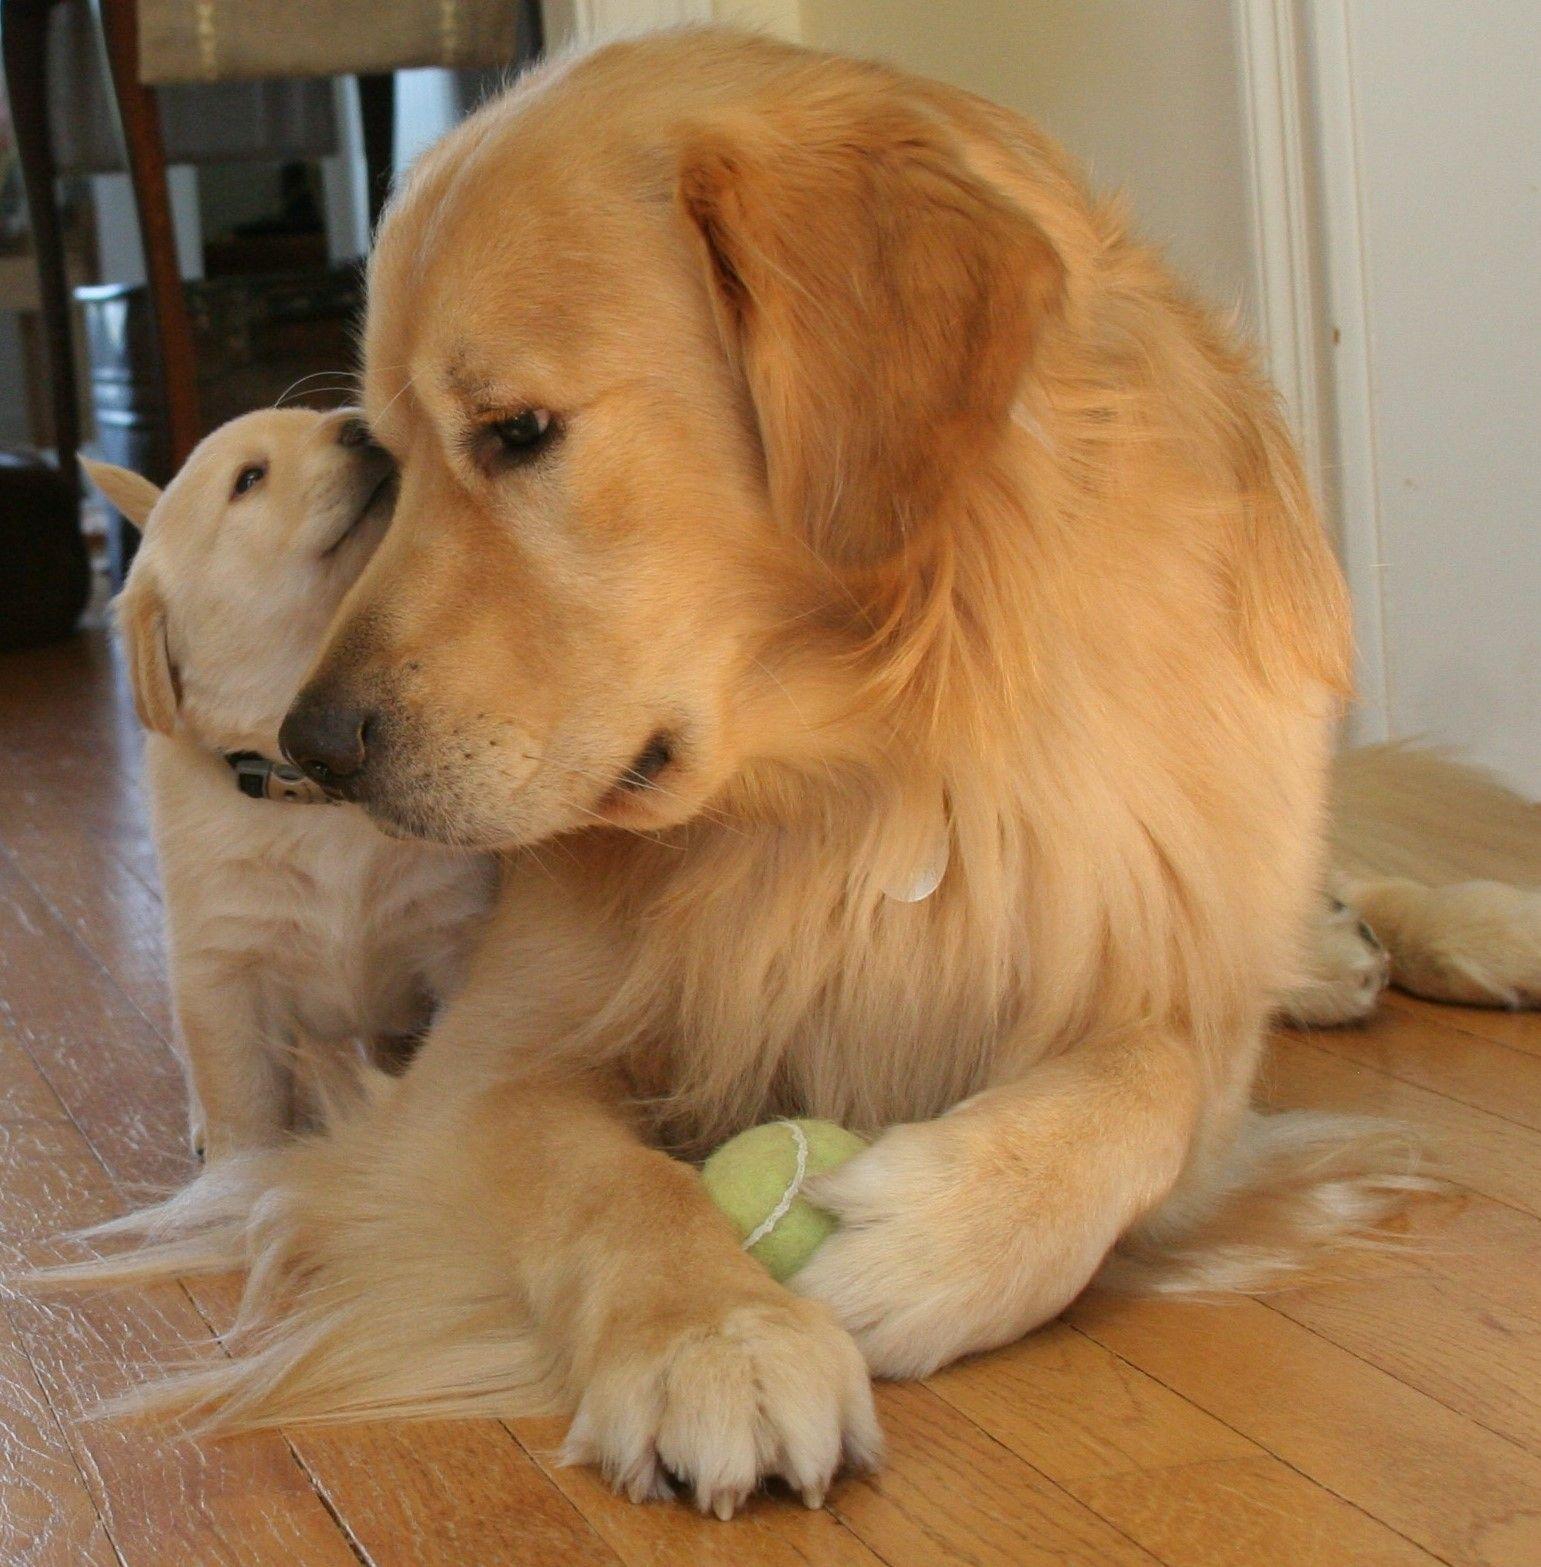 Coby and his pup...Berkley It looks like Berkley is whispering in his Dad's ear! :)